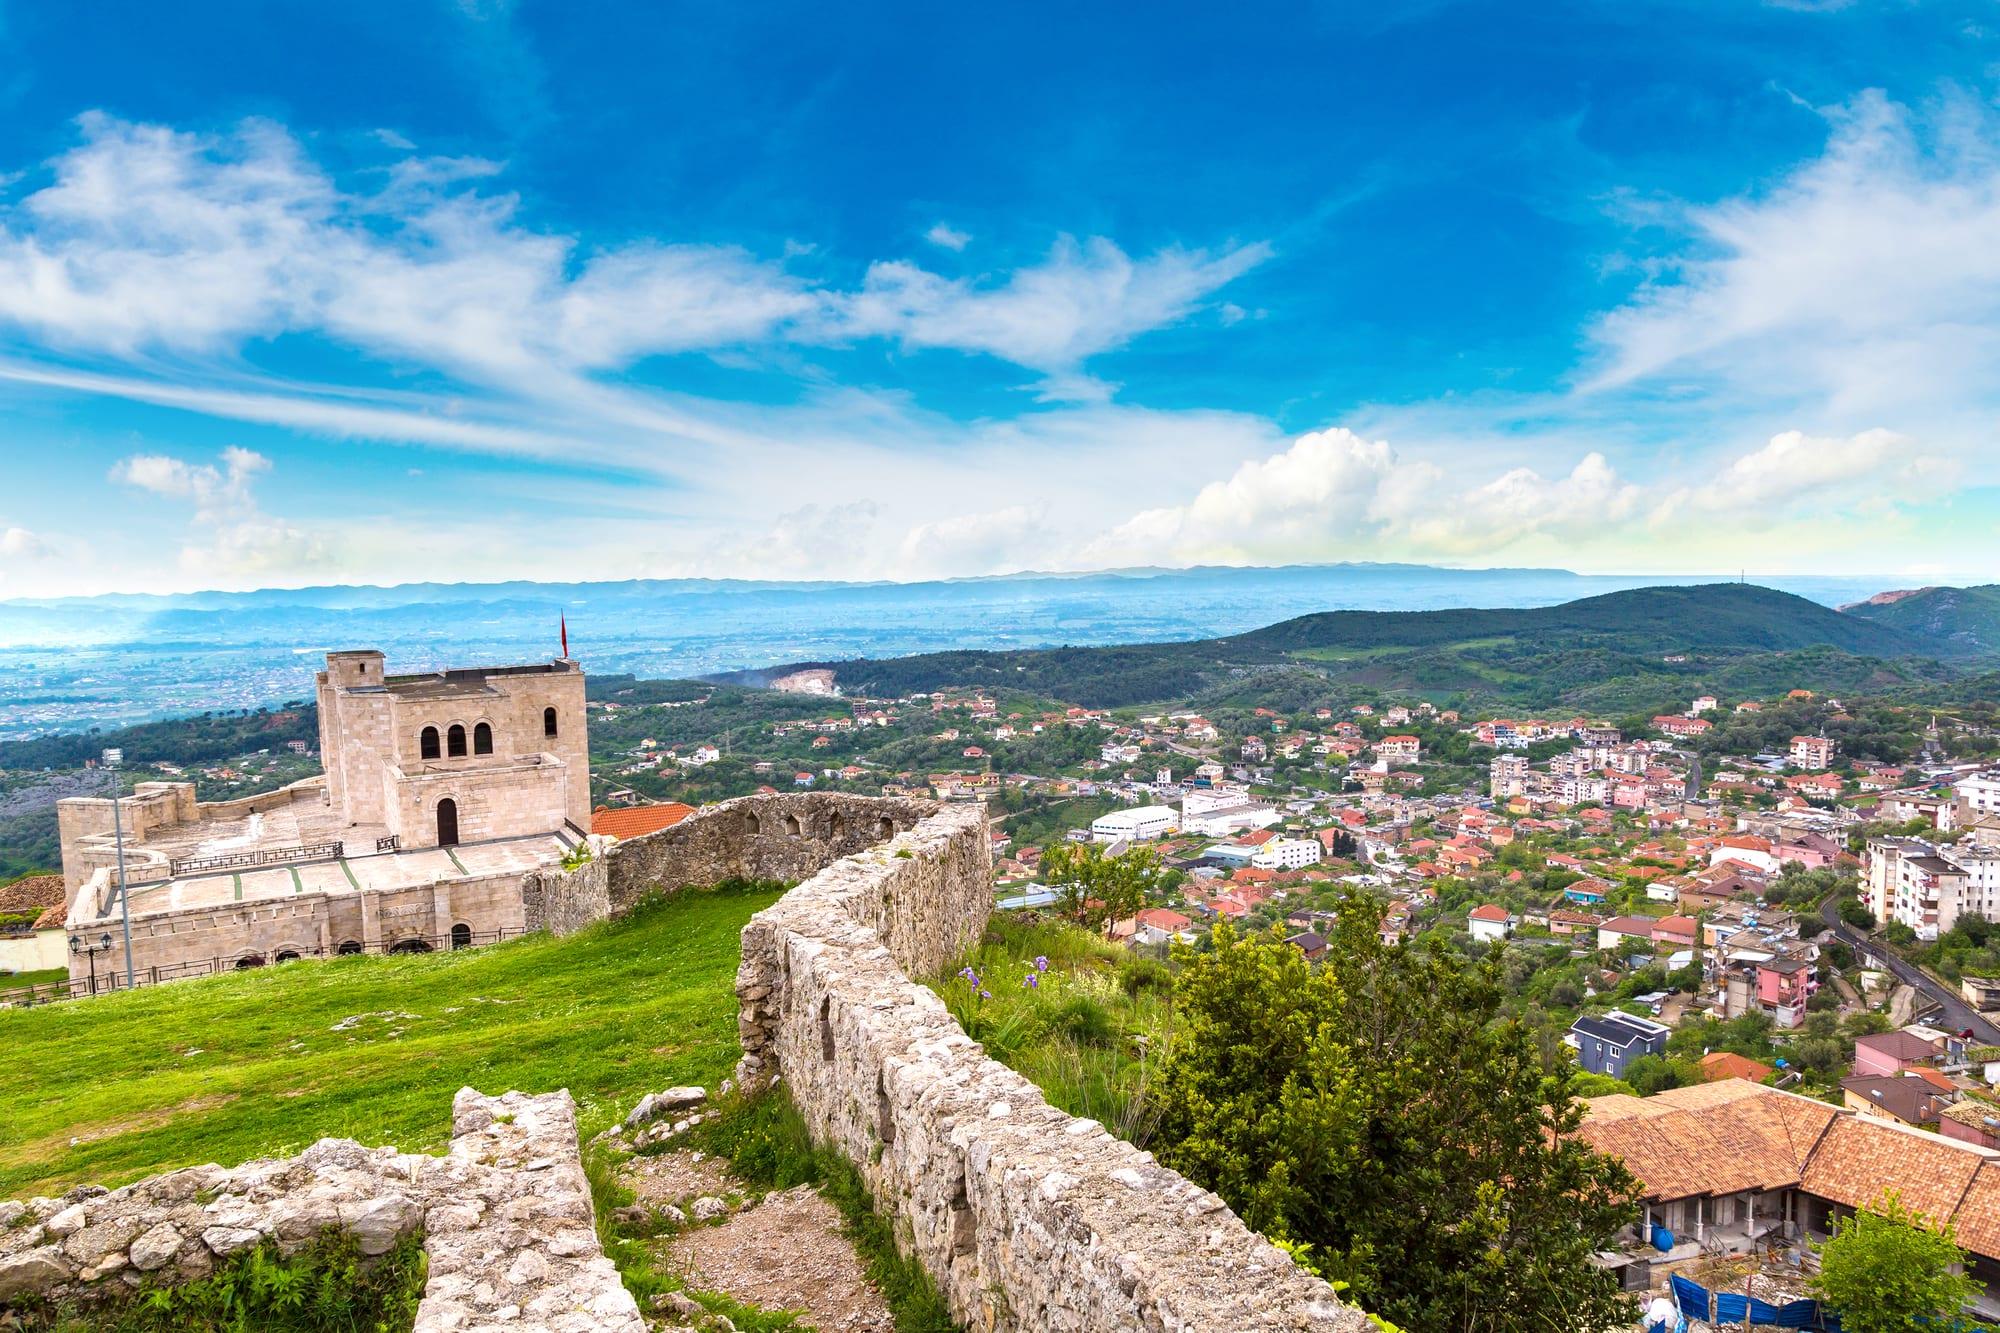 Albanien, Makedonien & Kosovo: Det skjulte Europa